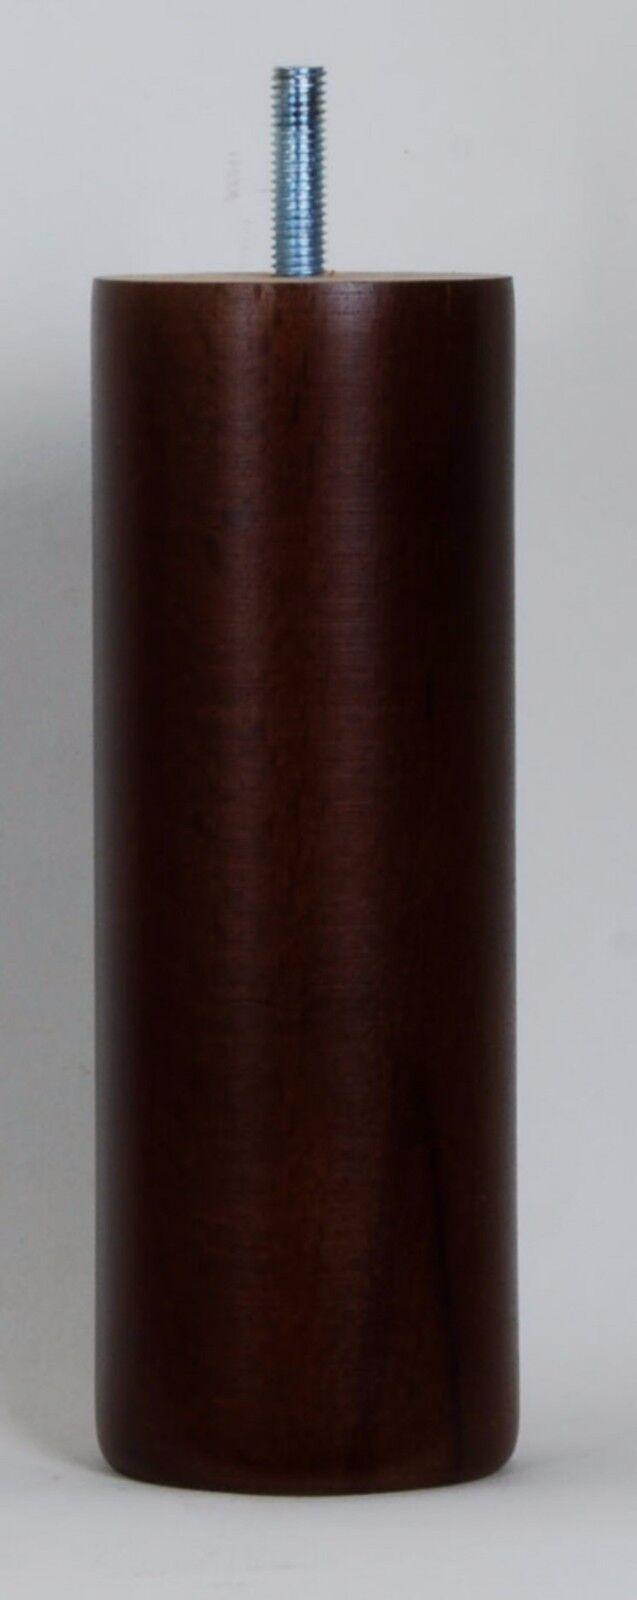 12 WOODEN SOFA LEGS E648-M with 35mm LONG DOWEL SCREWS, Footstool LEGS 160mm